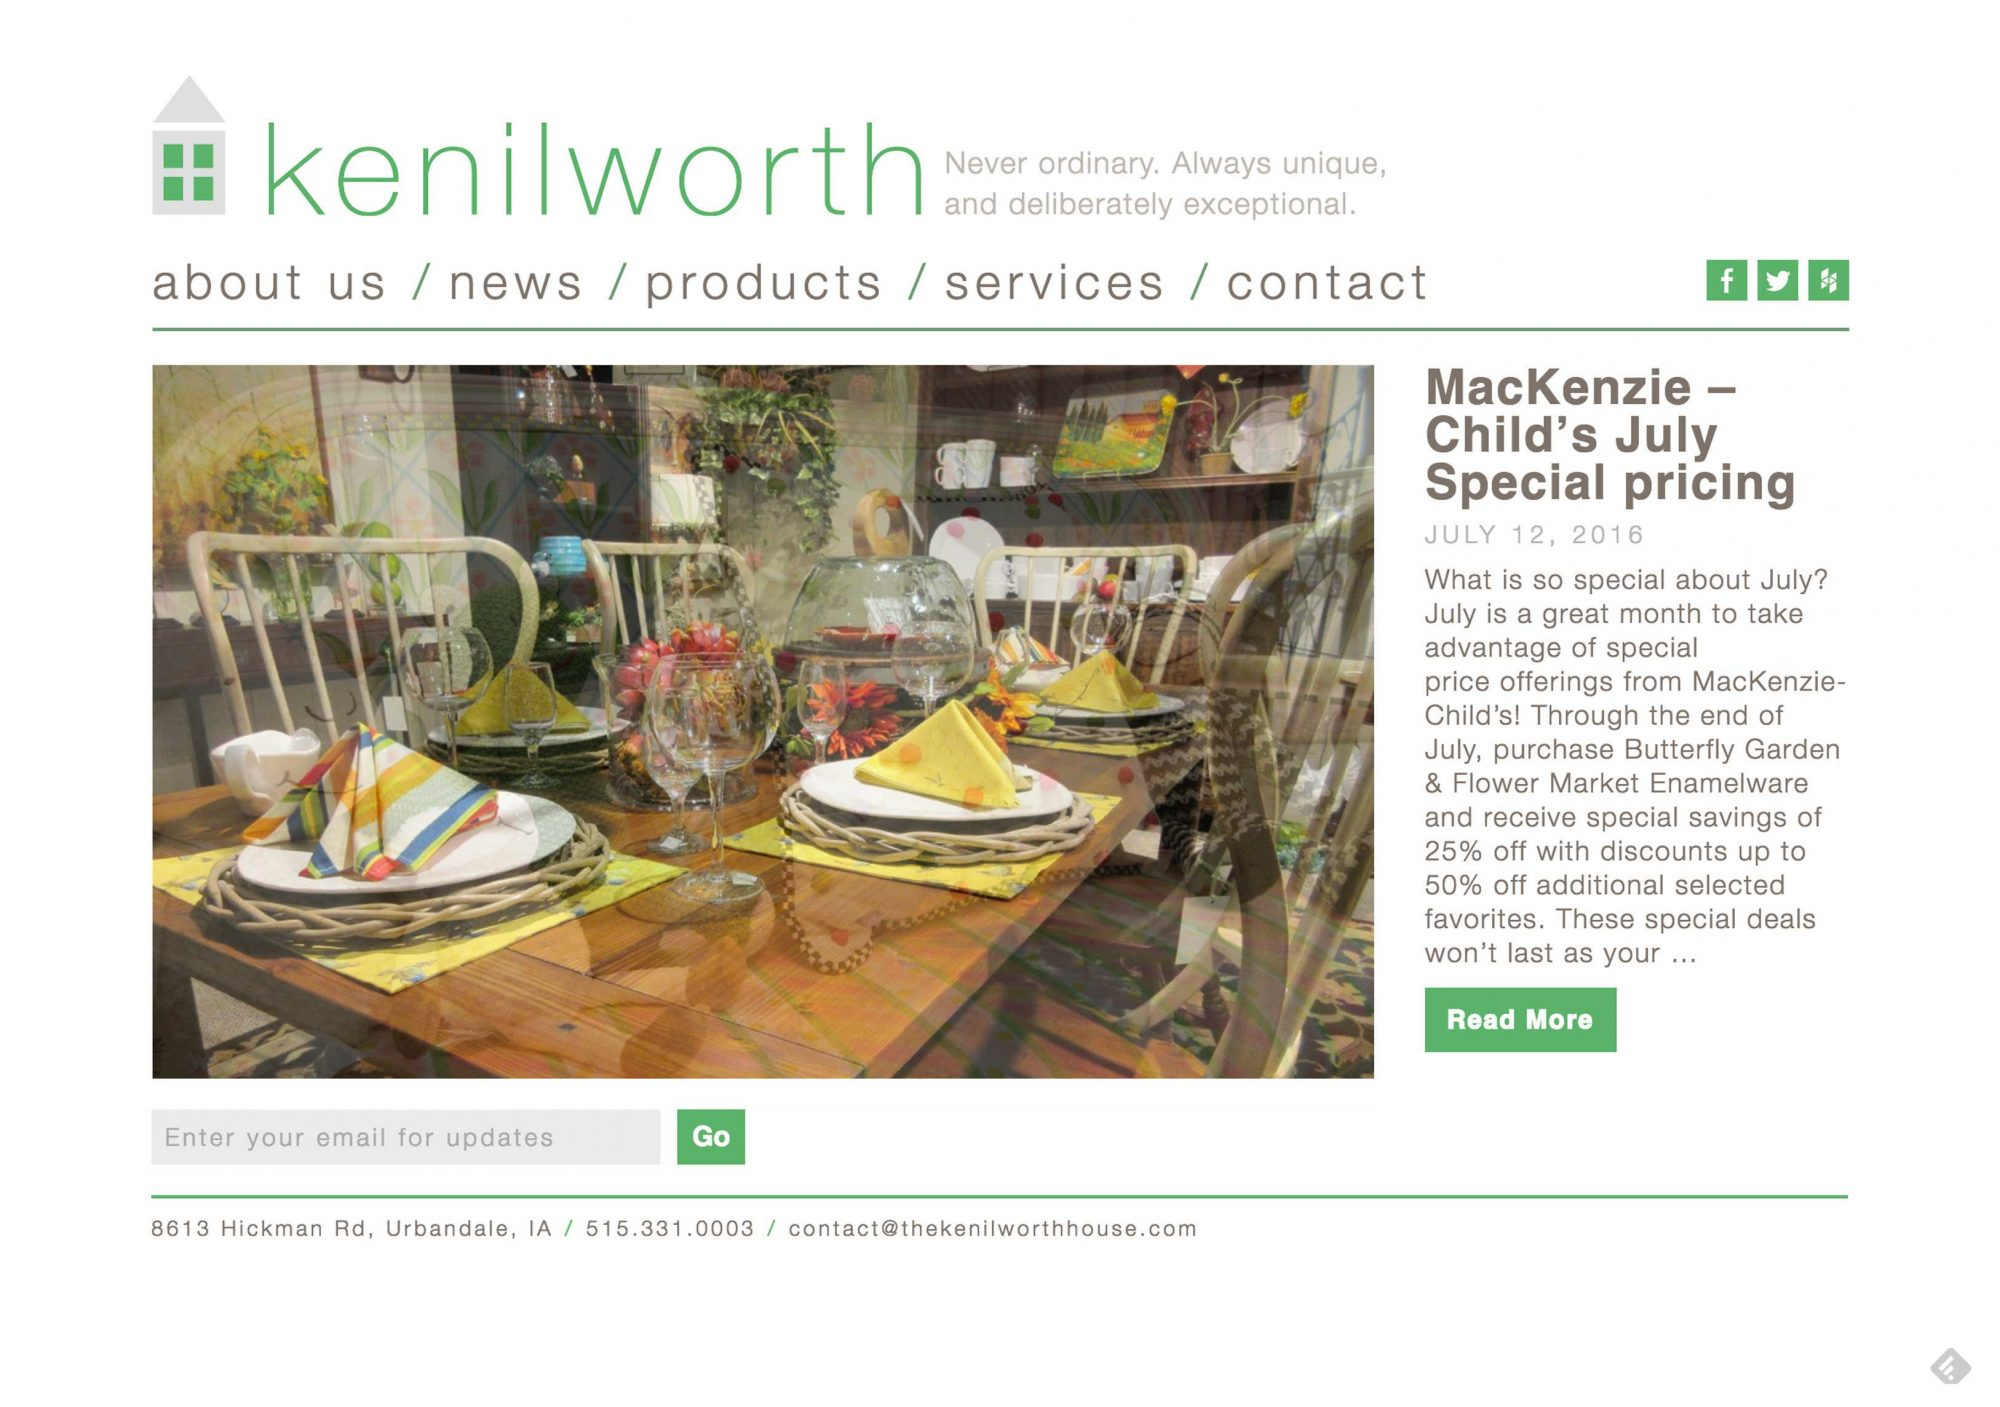 Kenilworth House v2.0